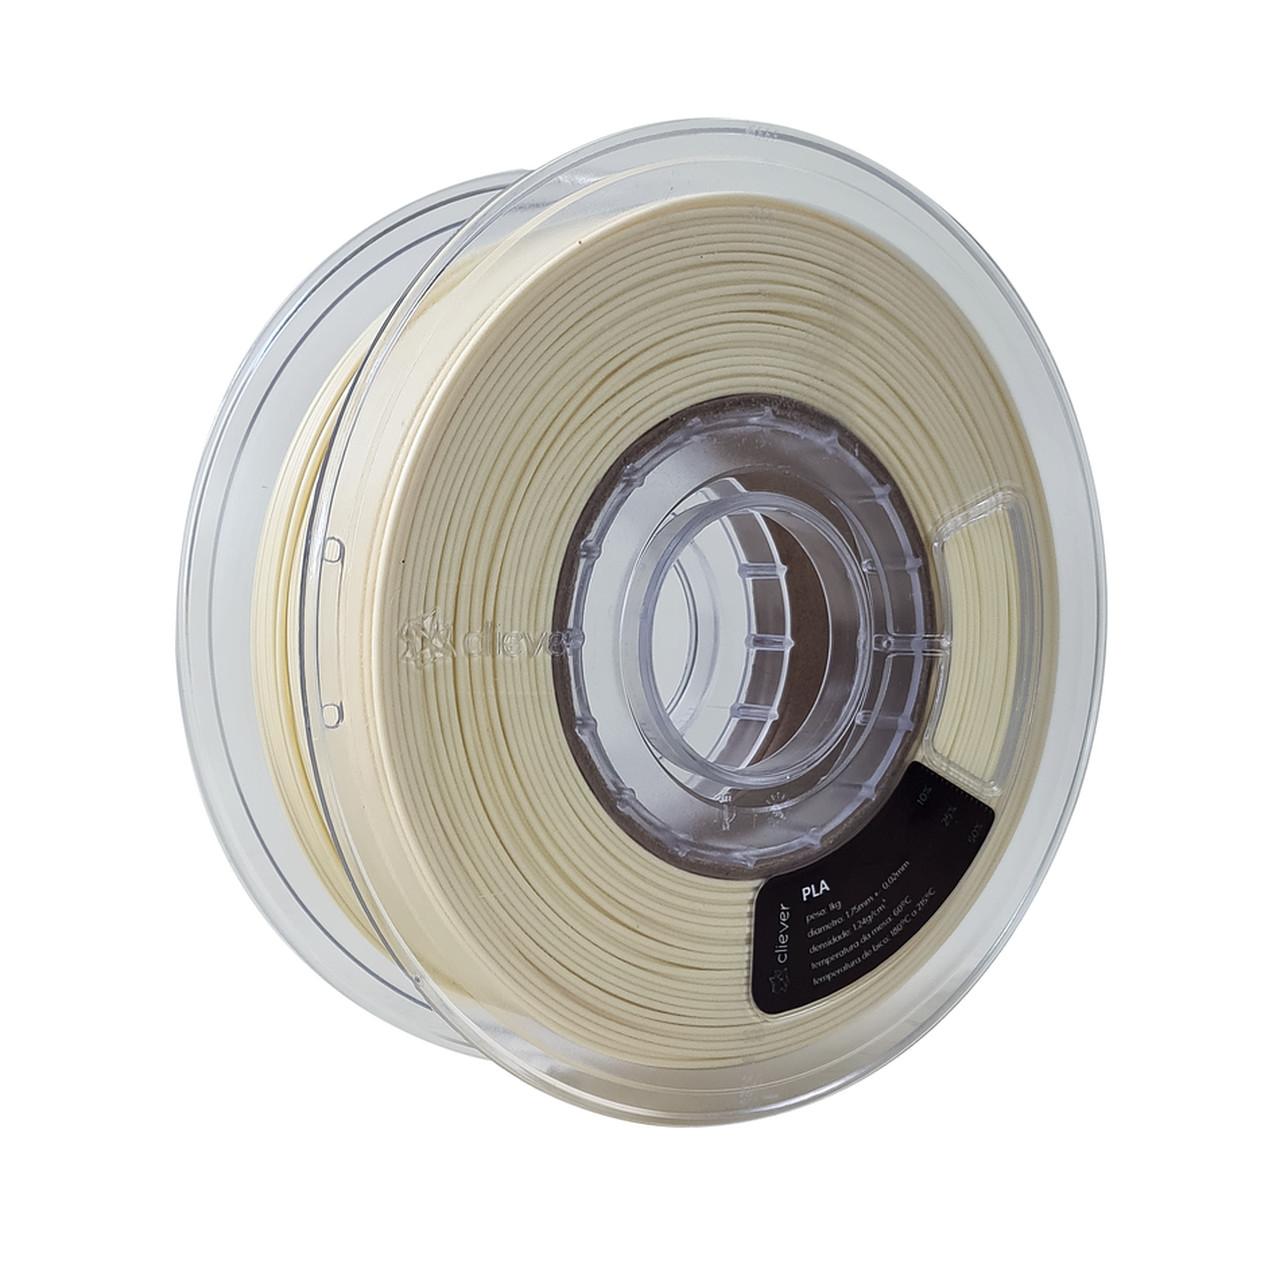 Filamento PLA - Creme - Cliever - 1.75mm - 1kg